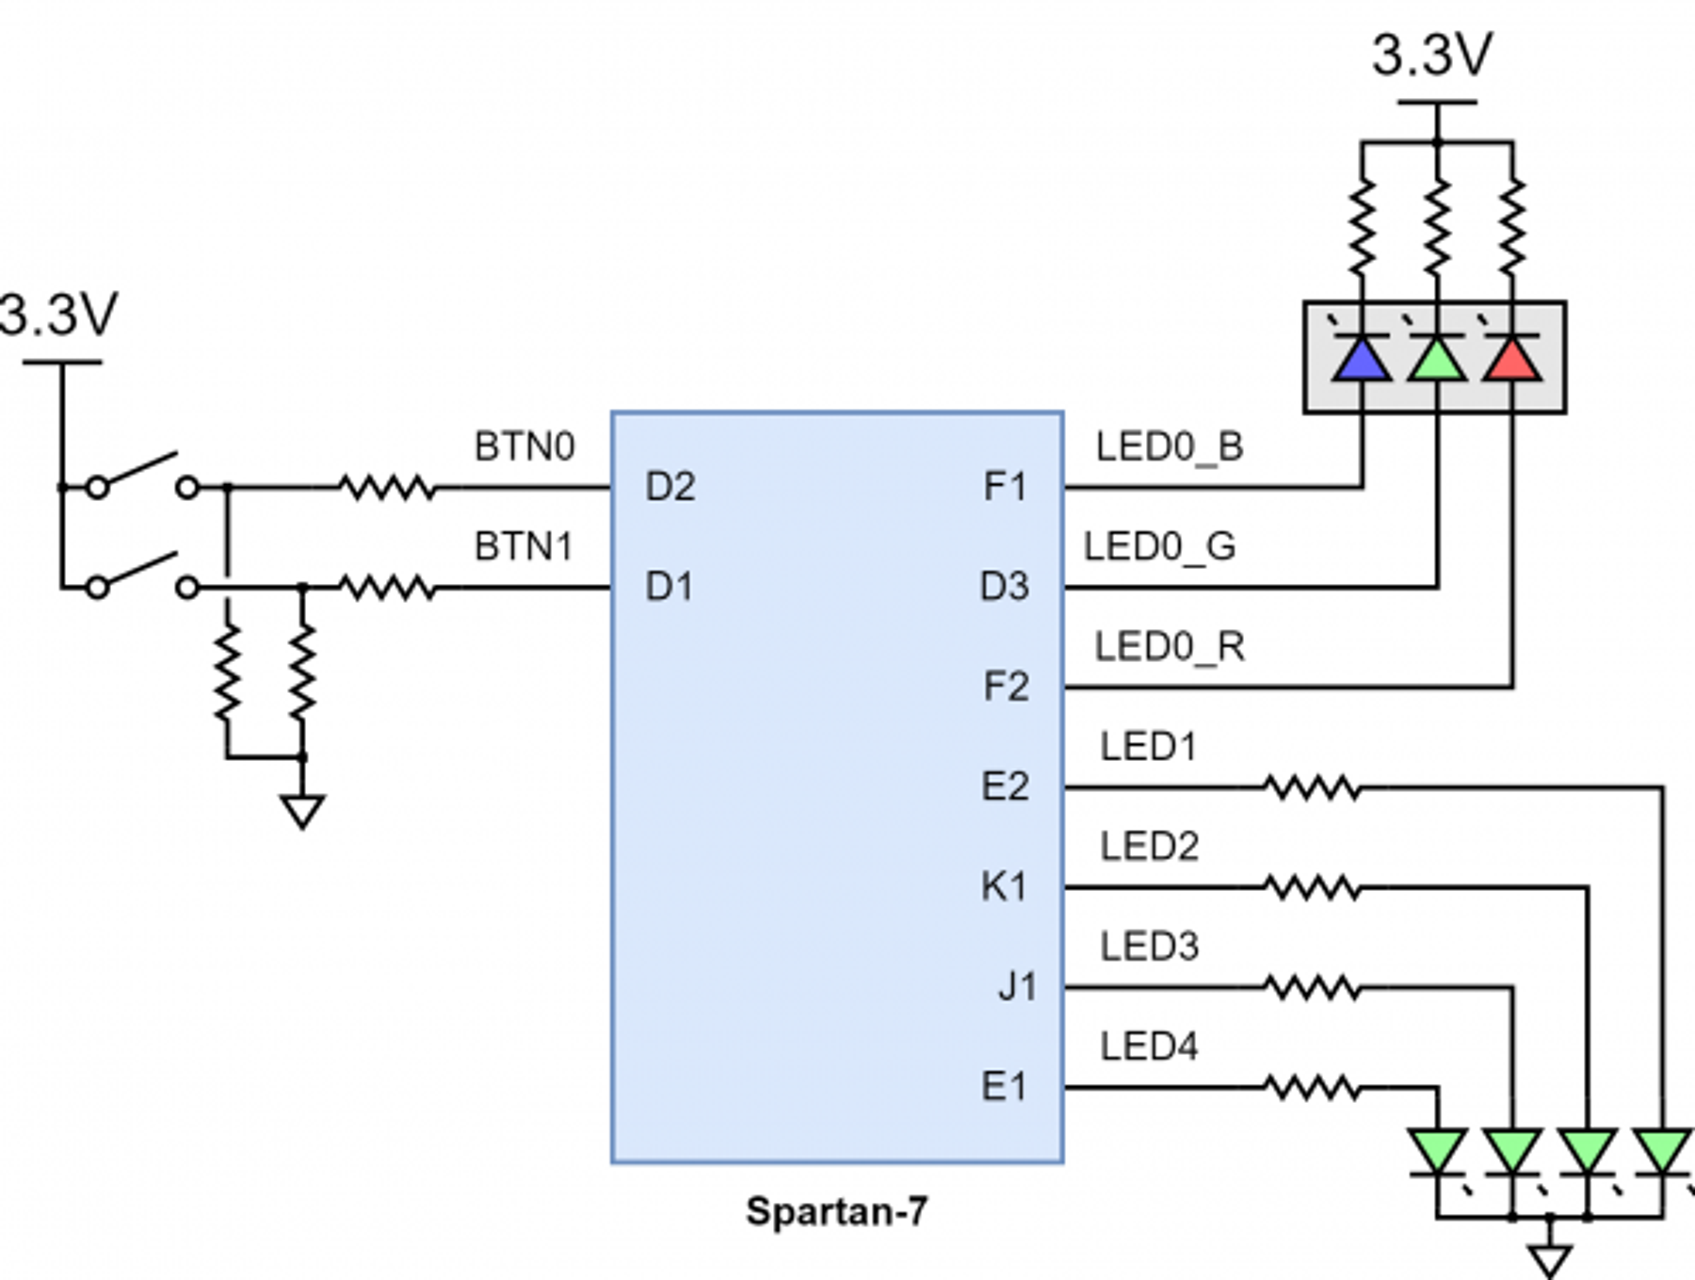 Figure 5.1 Cmod S7 Basic I/O